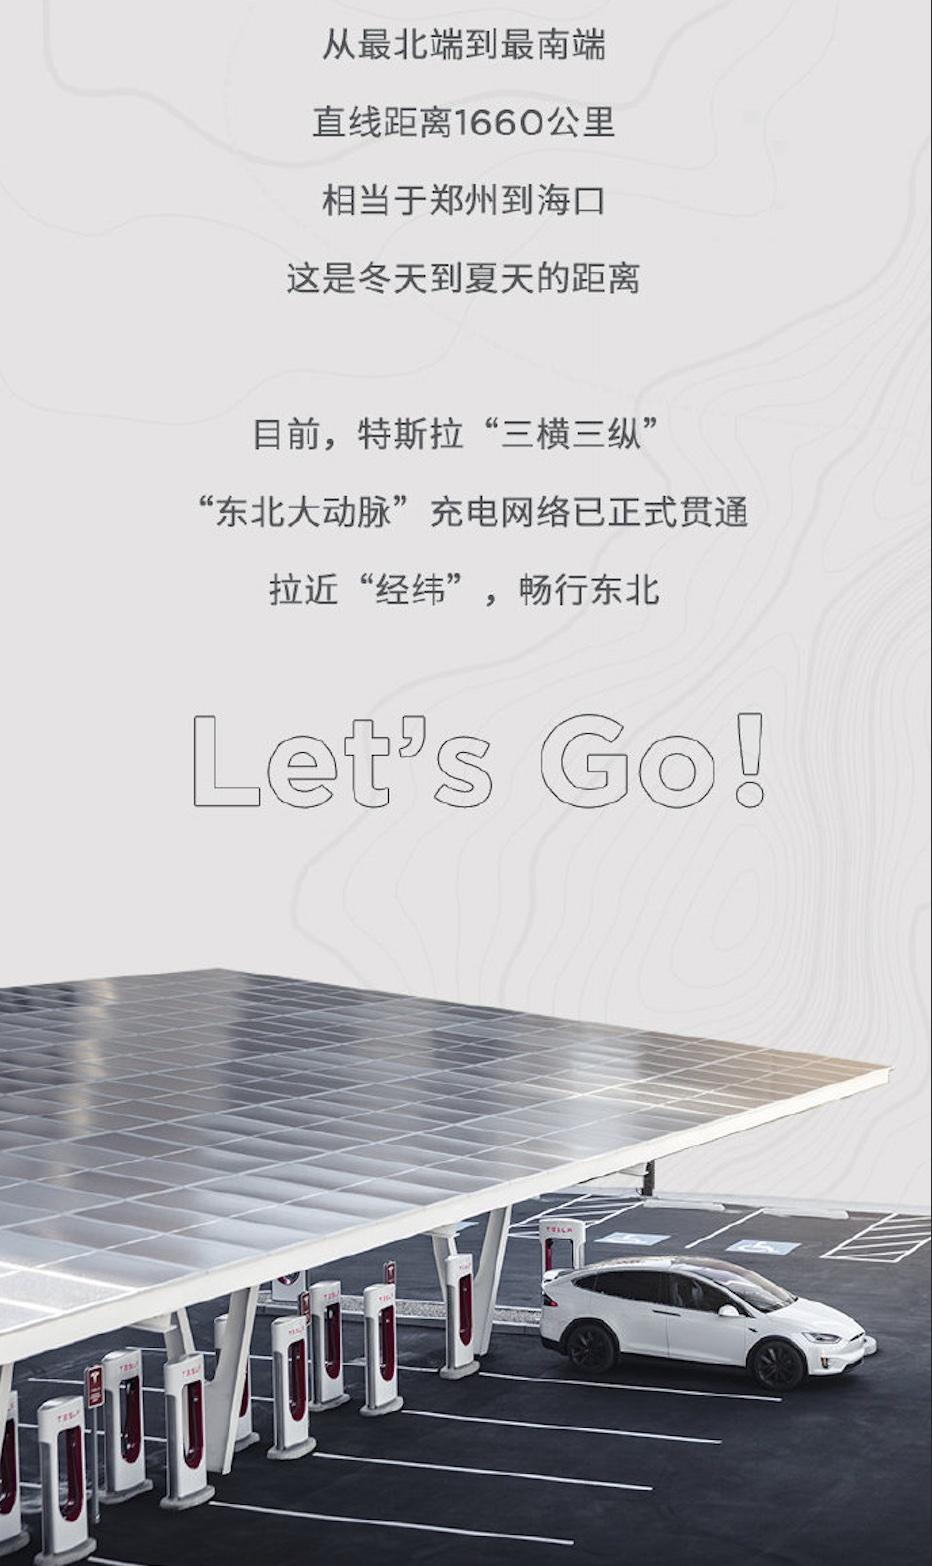 Tesla-china-supercharger-network-eastern-provinces